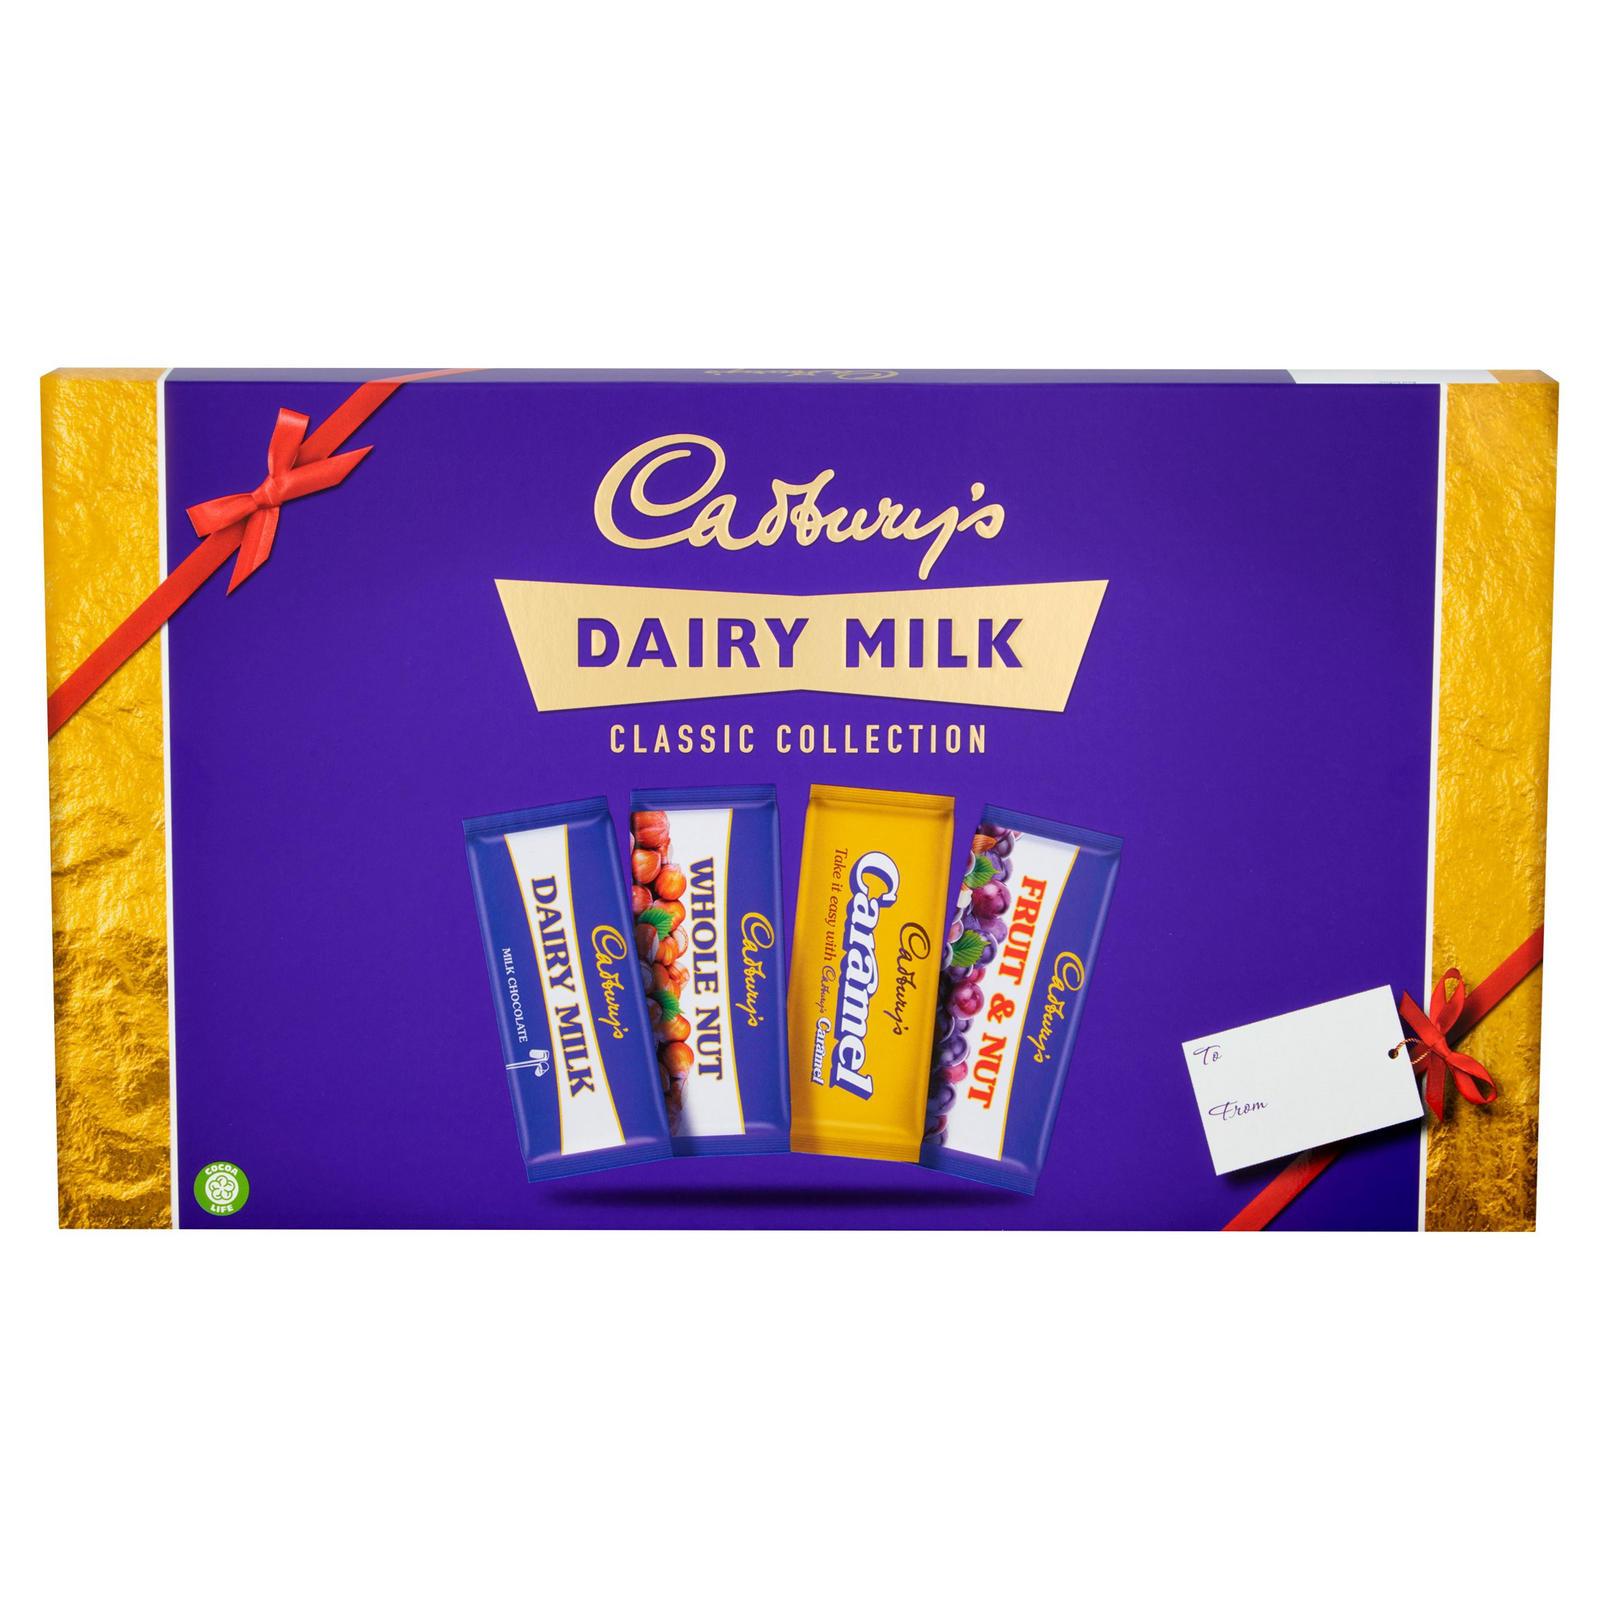 Cadbury Classic Retro Chocolate Selection Box at Iceland for £5